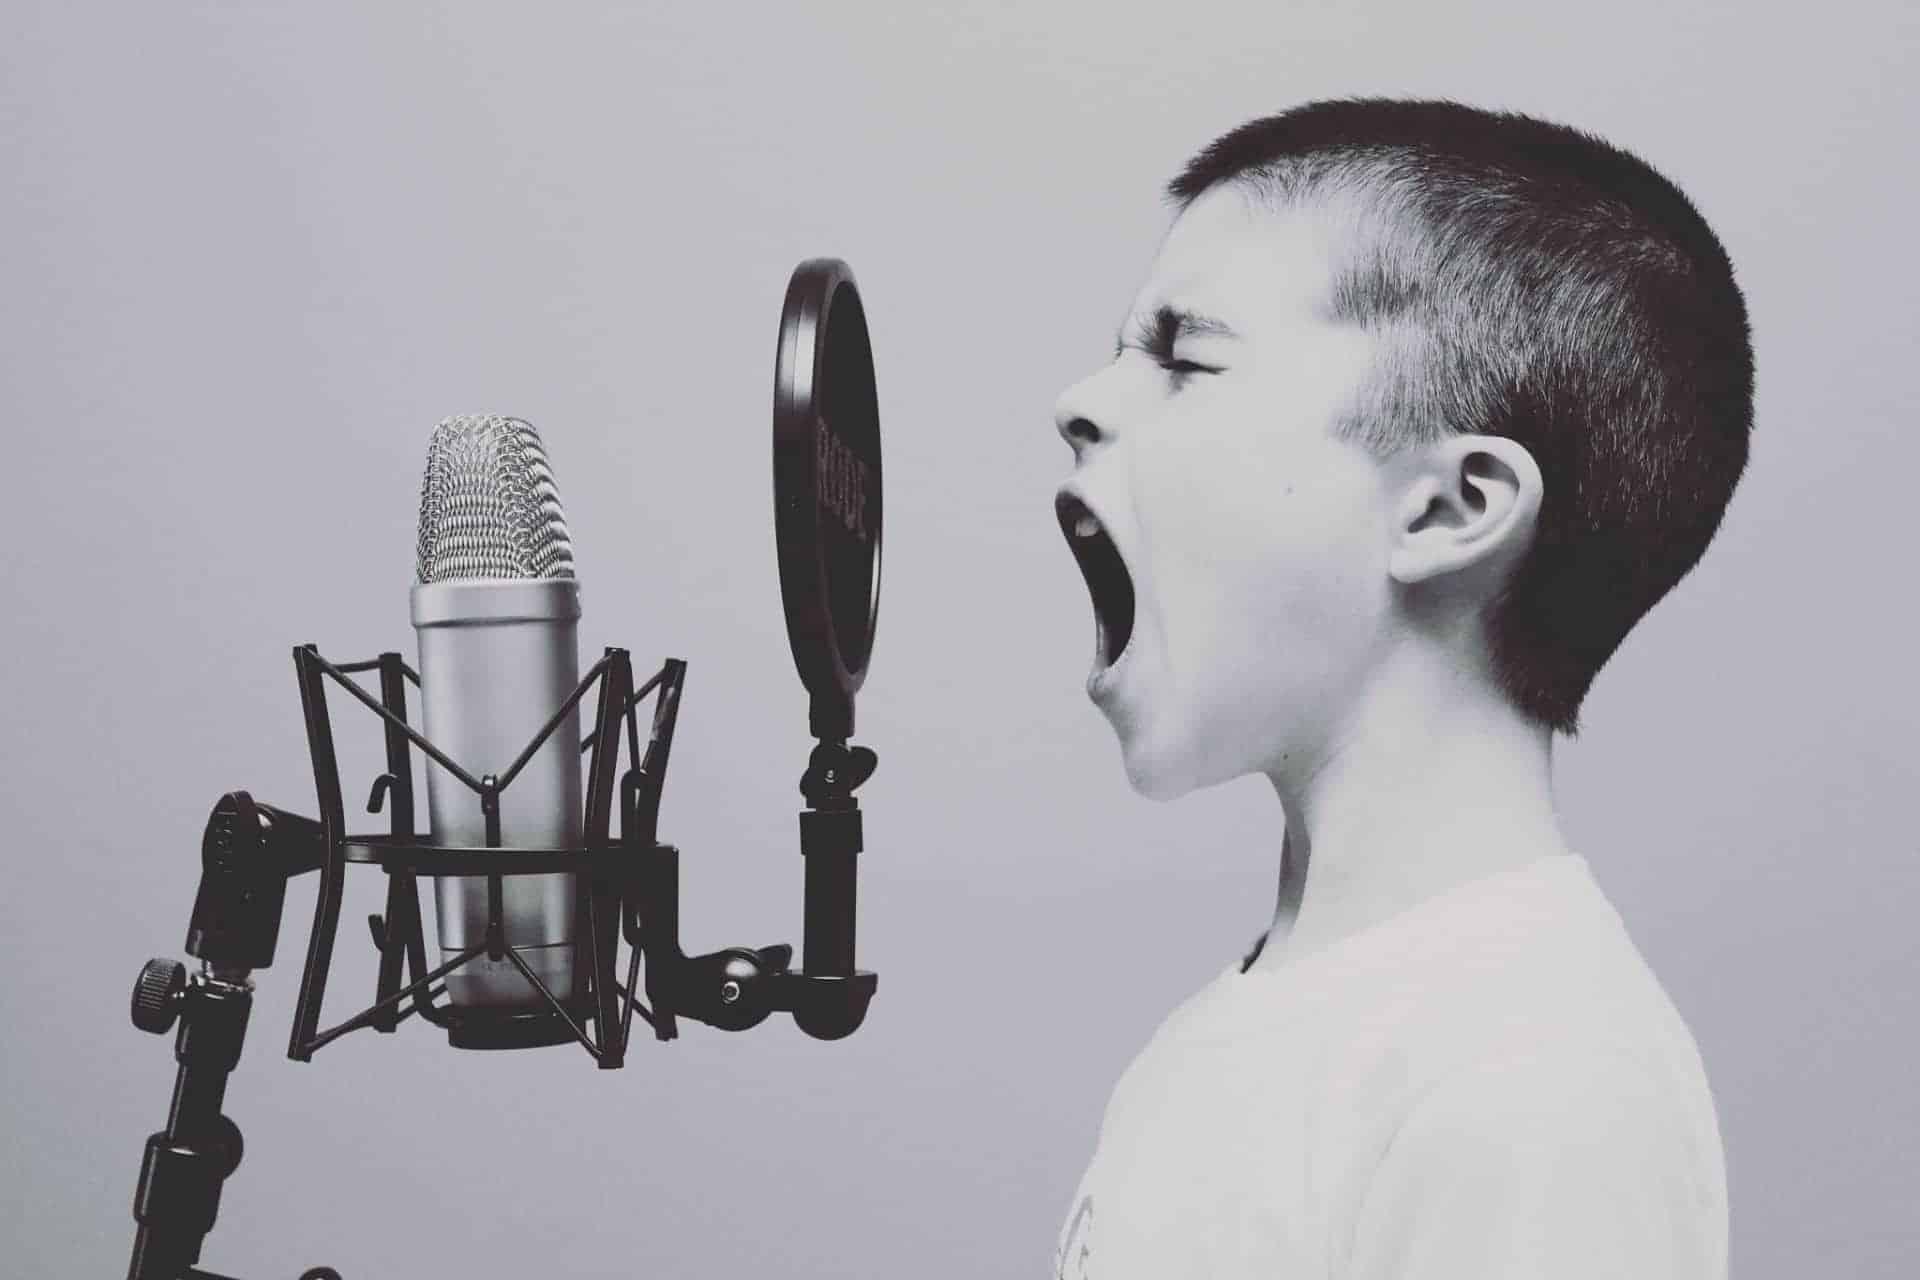 30 Day Challenge to Grow Your Music Studio